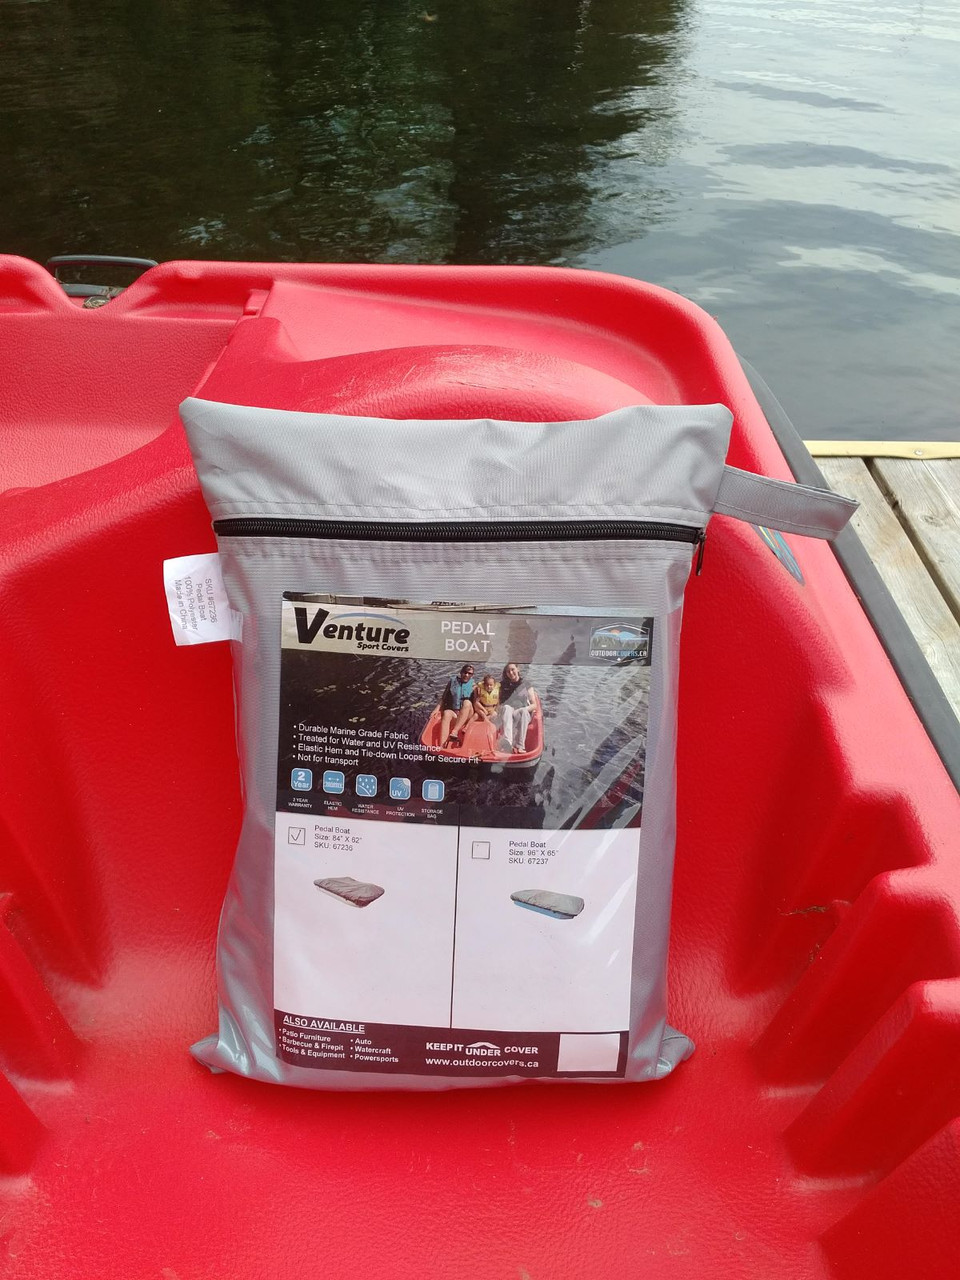 Venture Pedal Boat cover handy storage bag